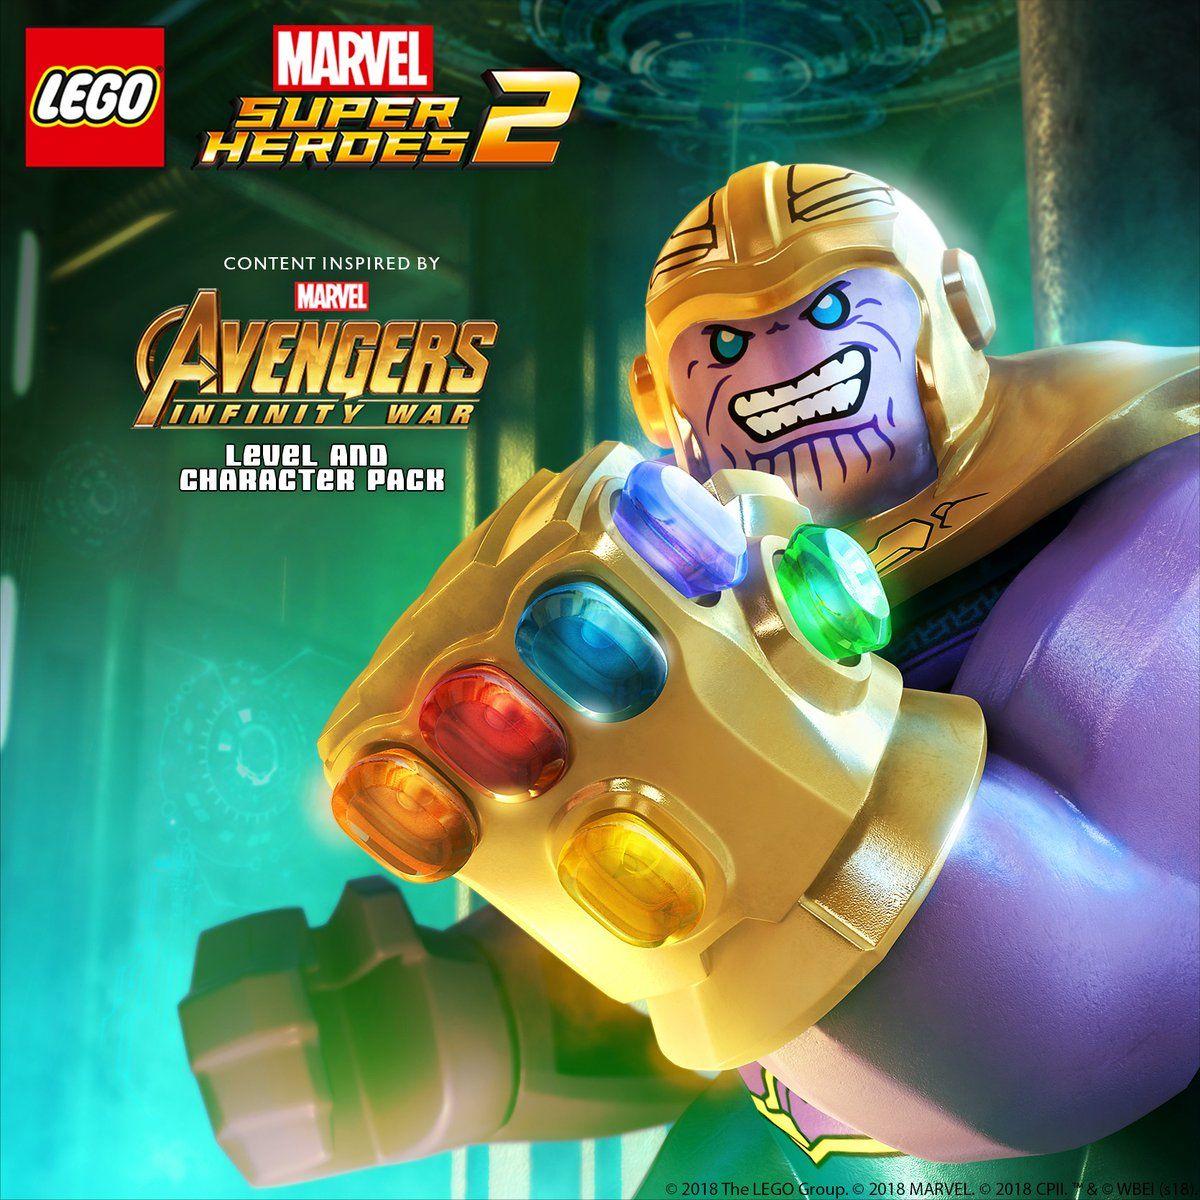 Lego marvel super heroes 2 avengers infinity war dlc promo art